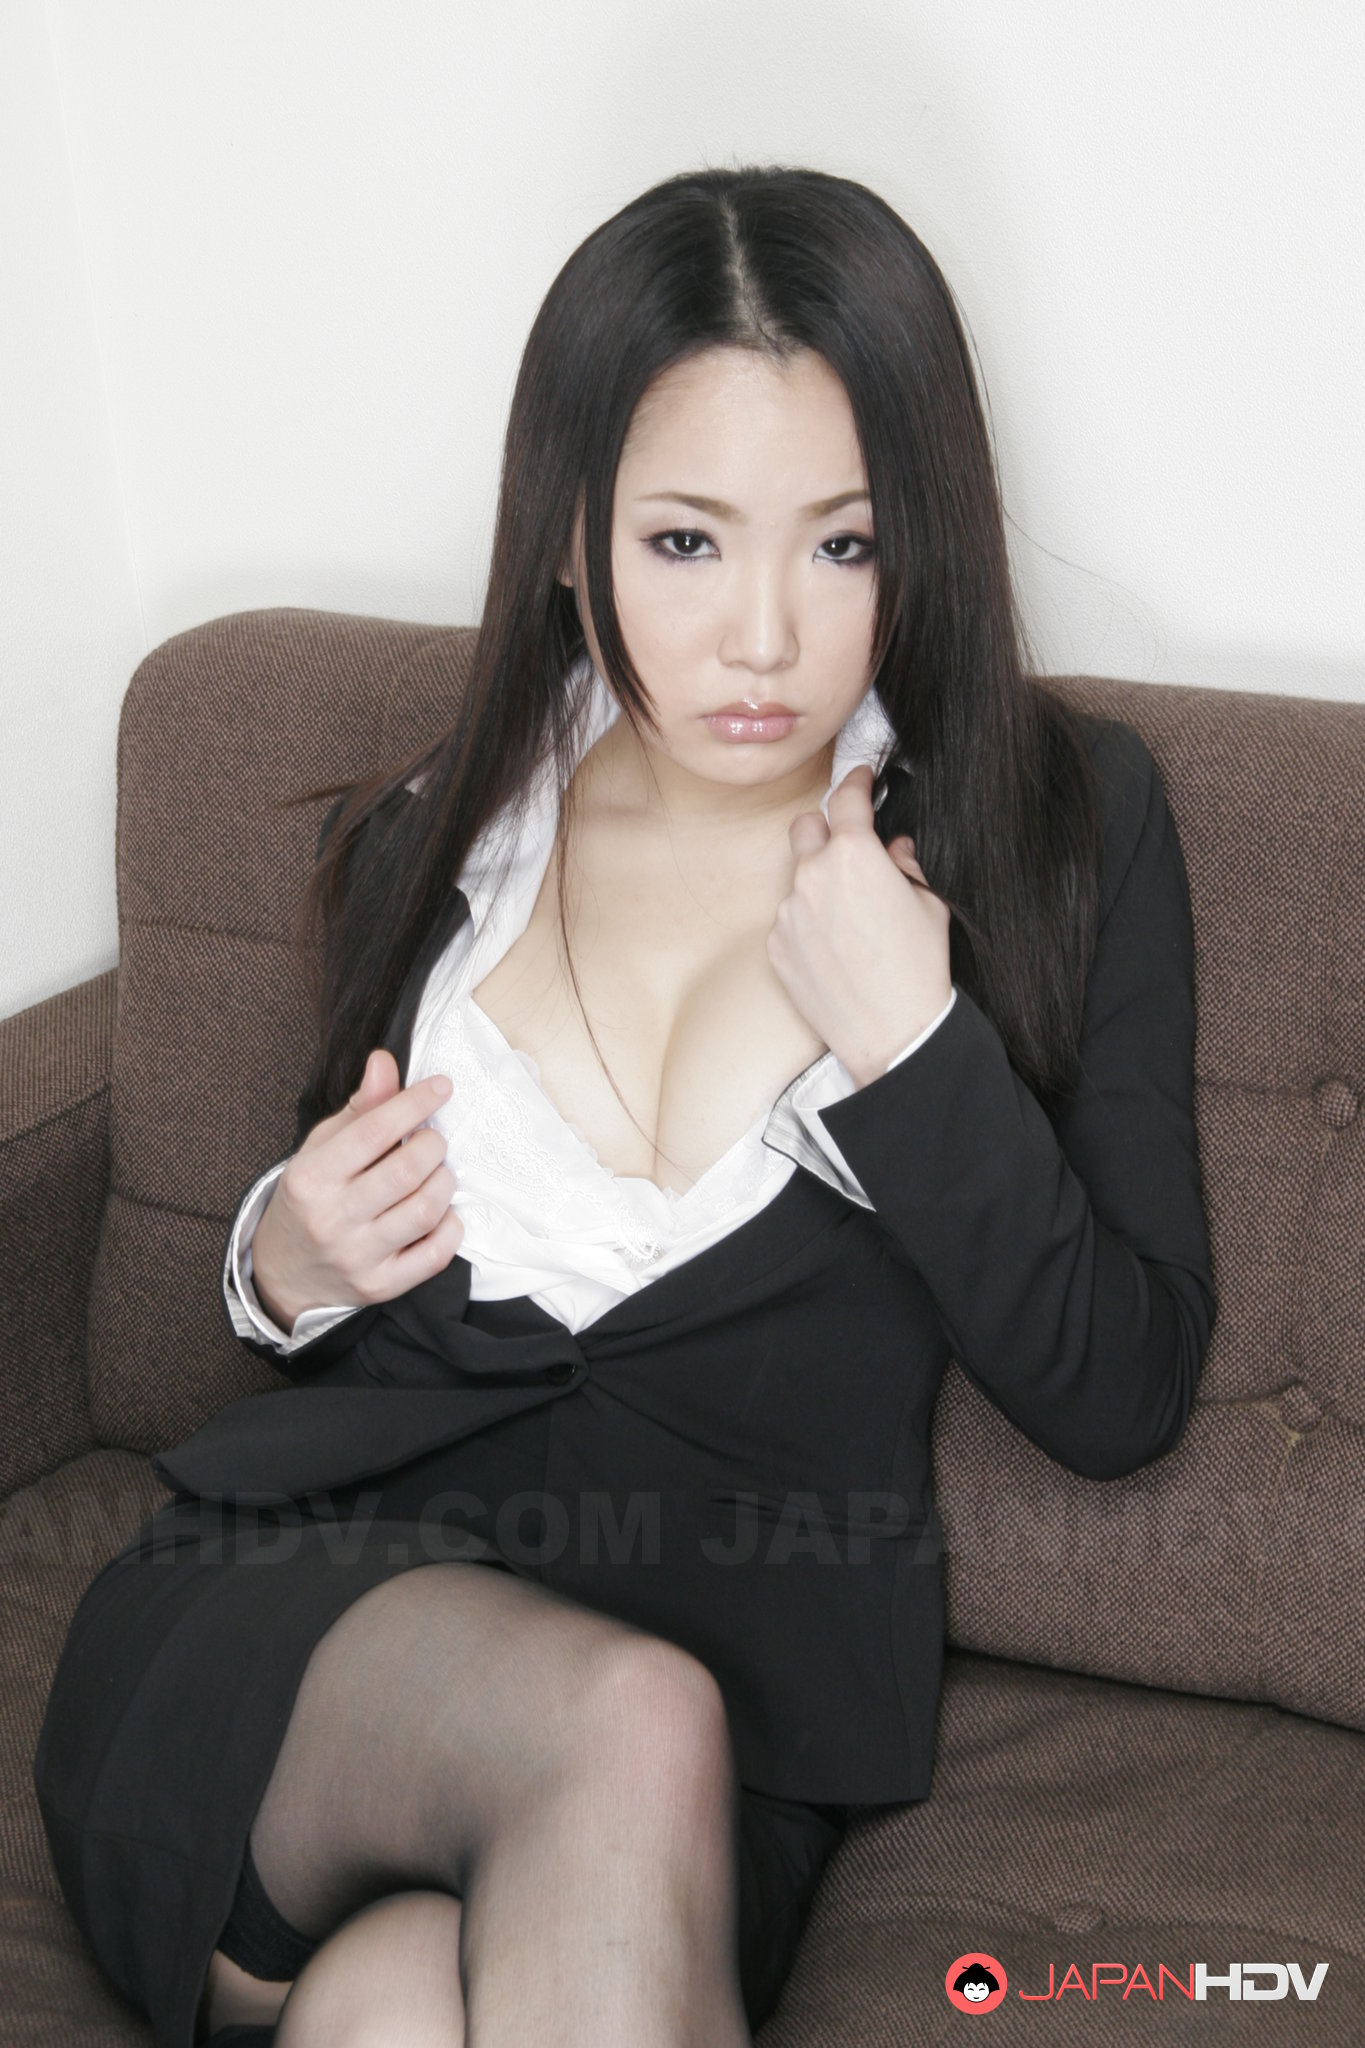 Japan queen pussy